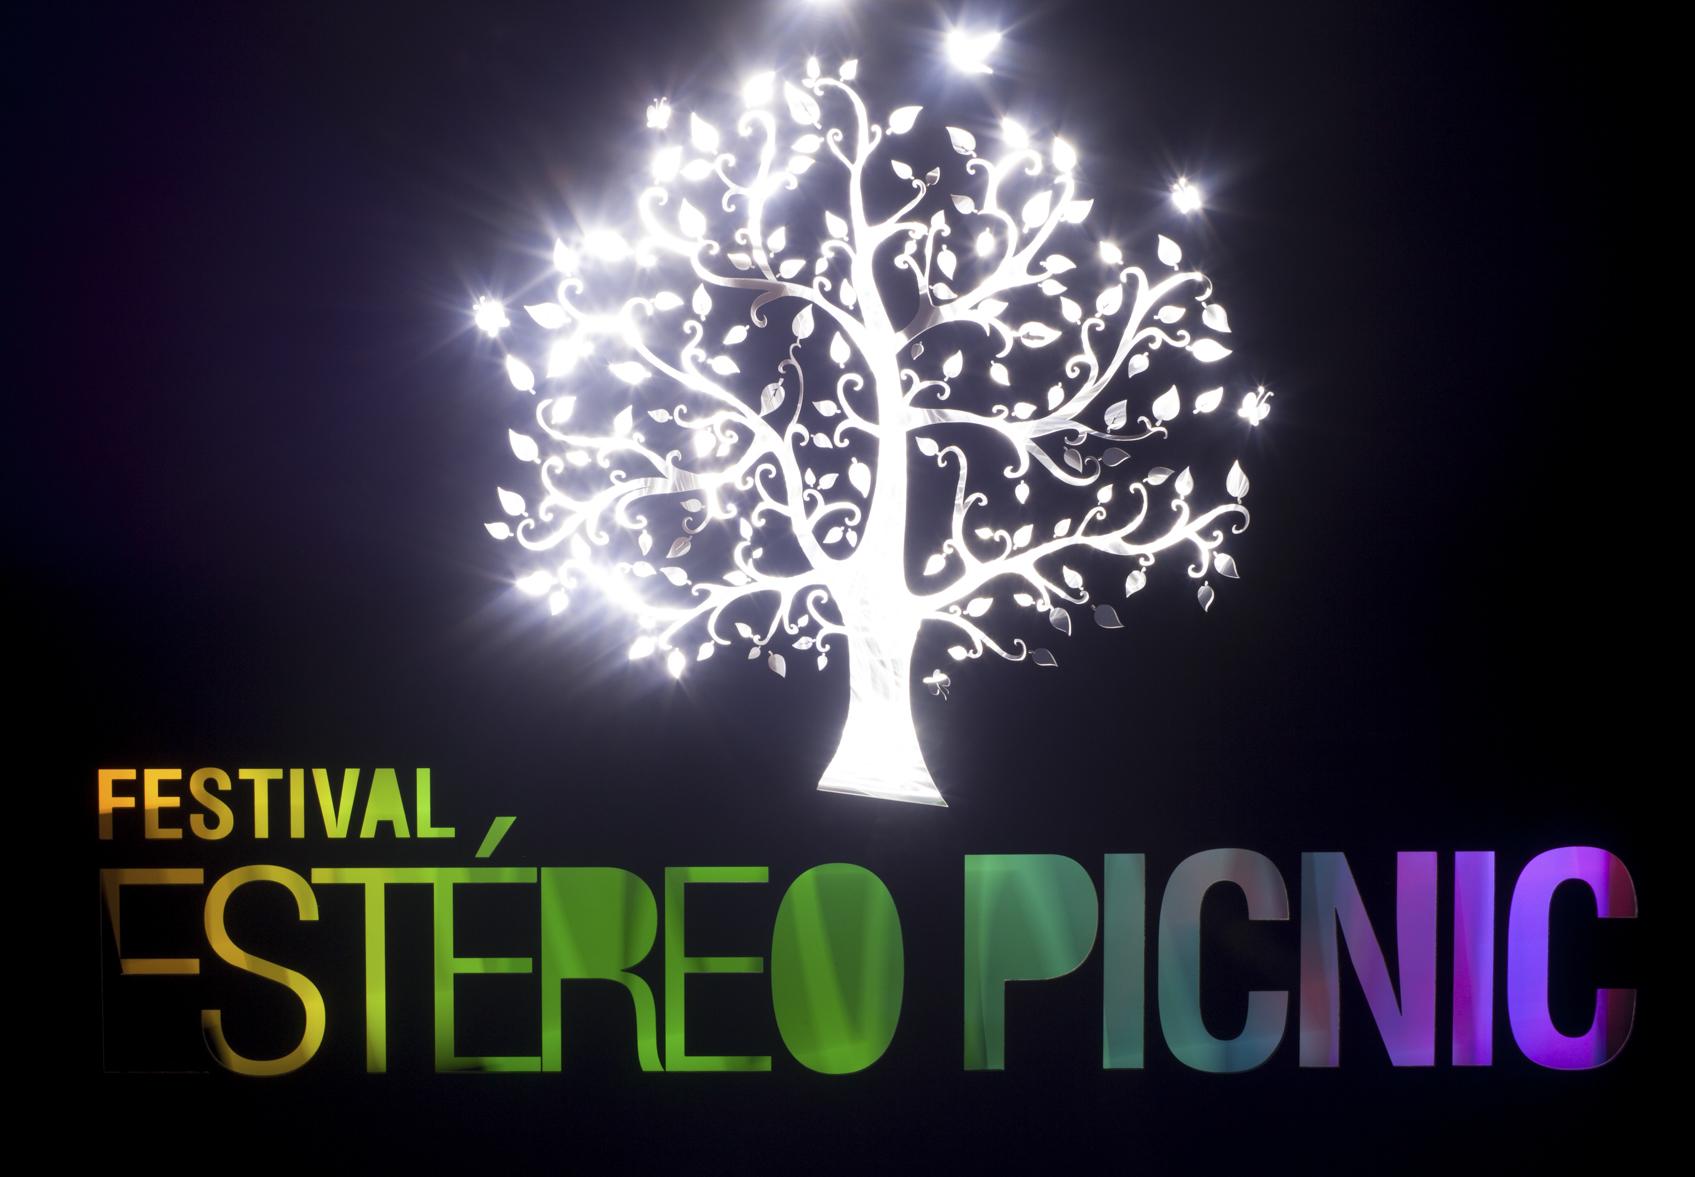 Estereo Picninc 2014 Logo-4.jpg